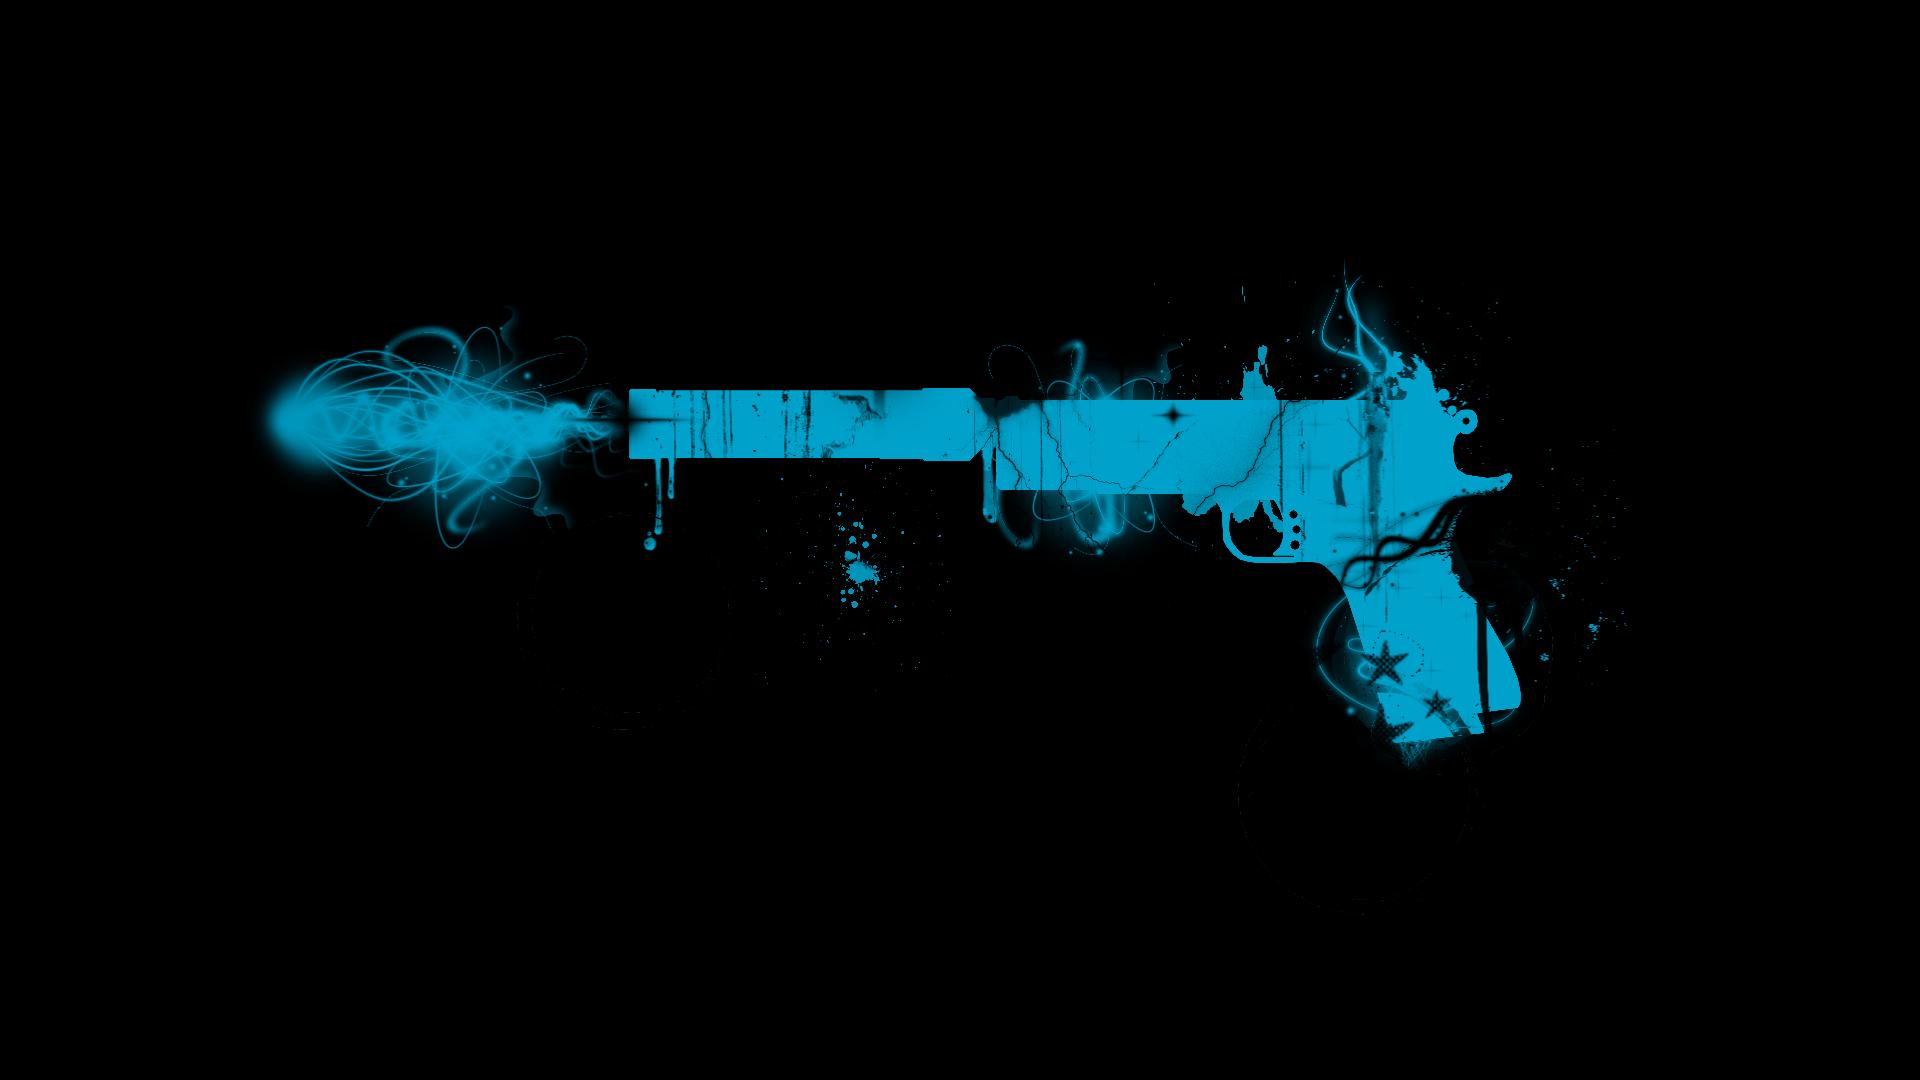 Colt 1911 Wallpaper by Danchix 1920x1080